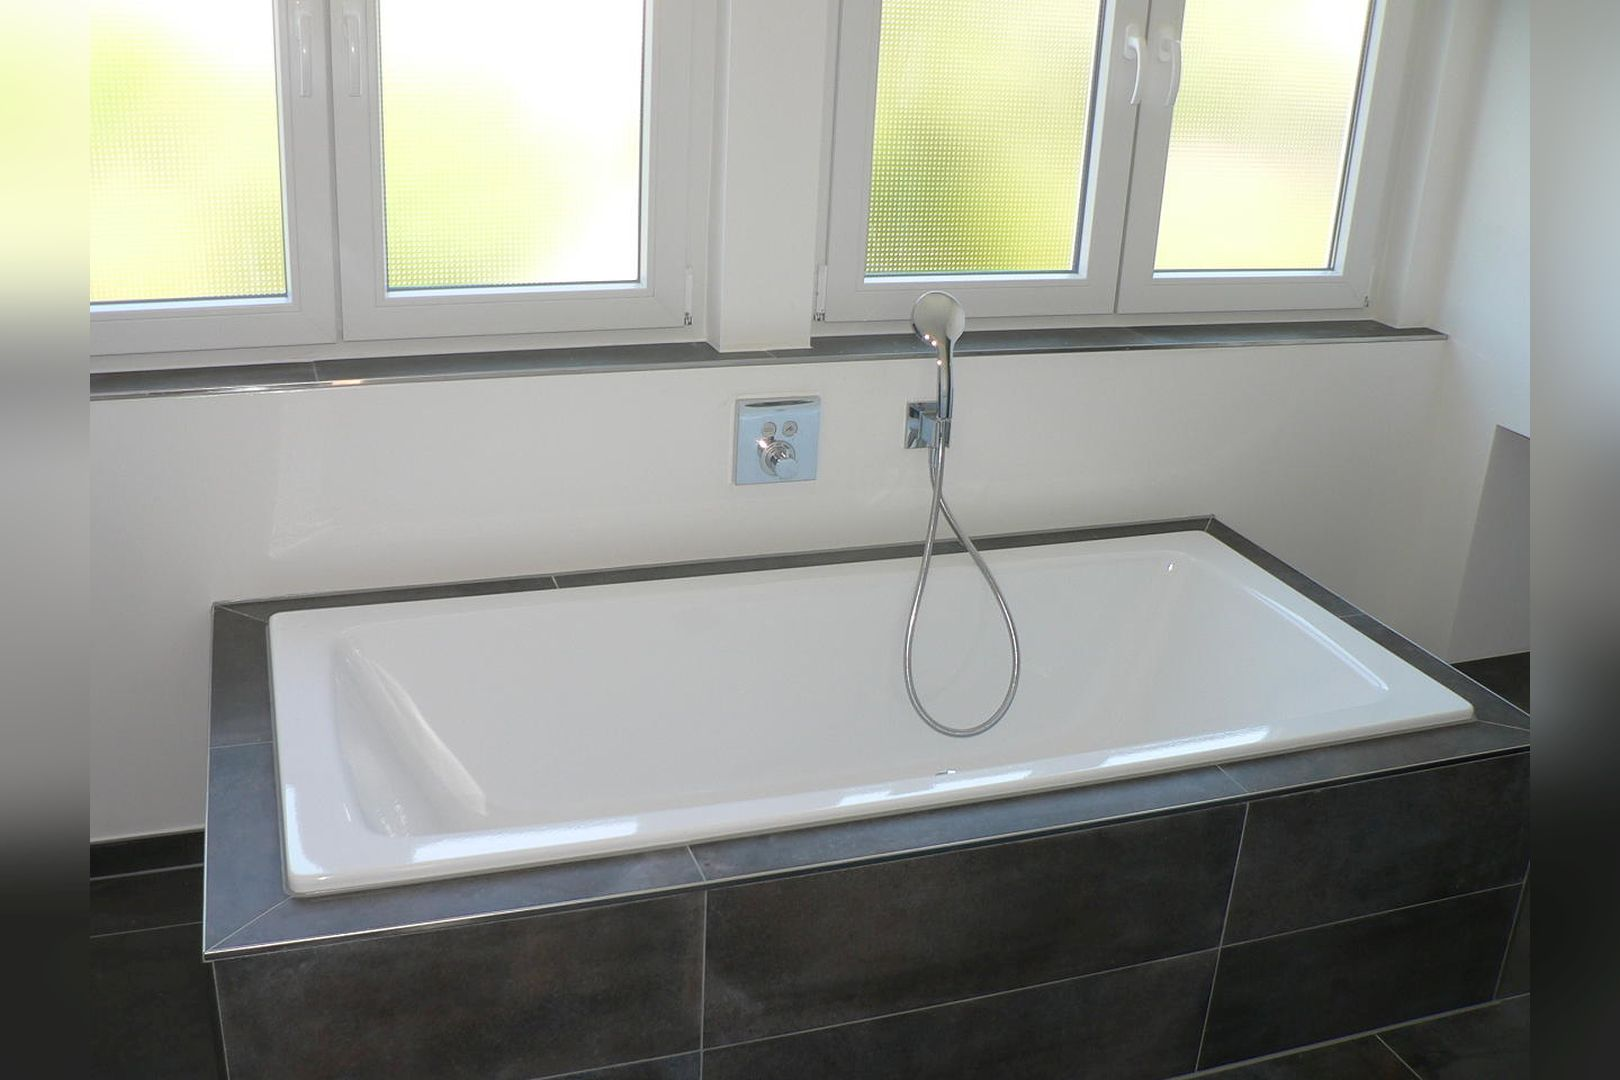 Immobilie Nr.0230 | Taubenacker 3, 40668 Meerbusch - Lank